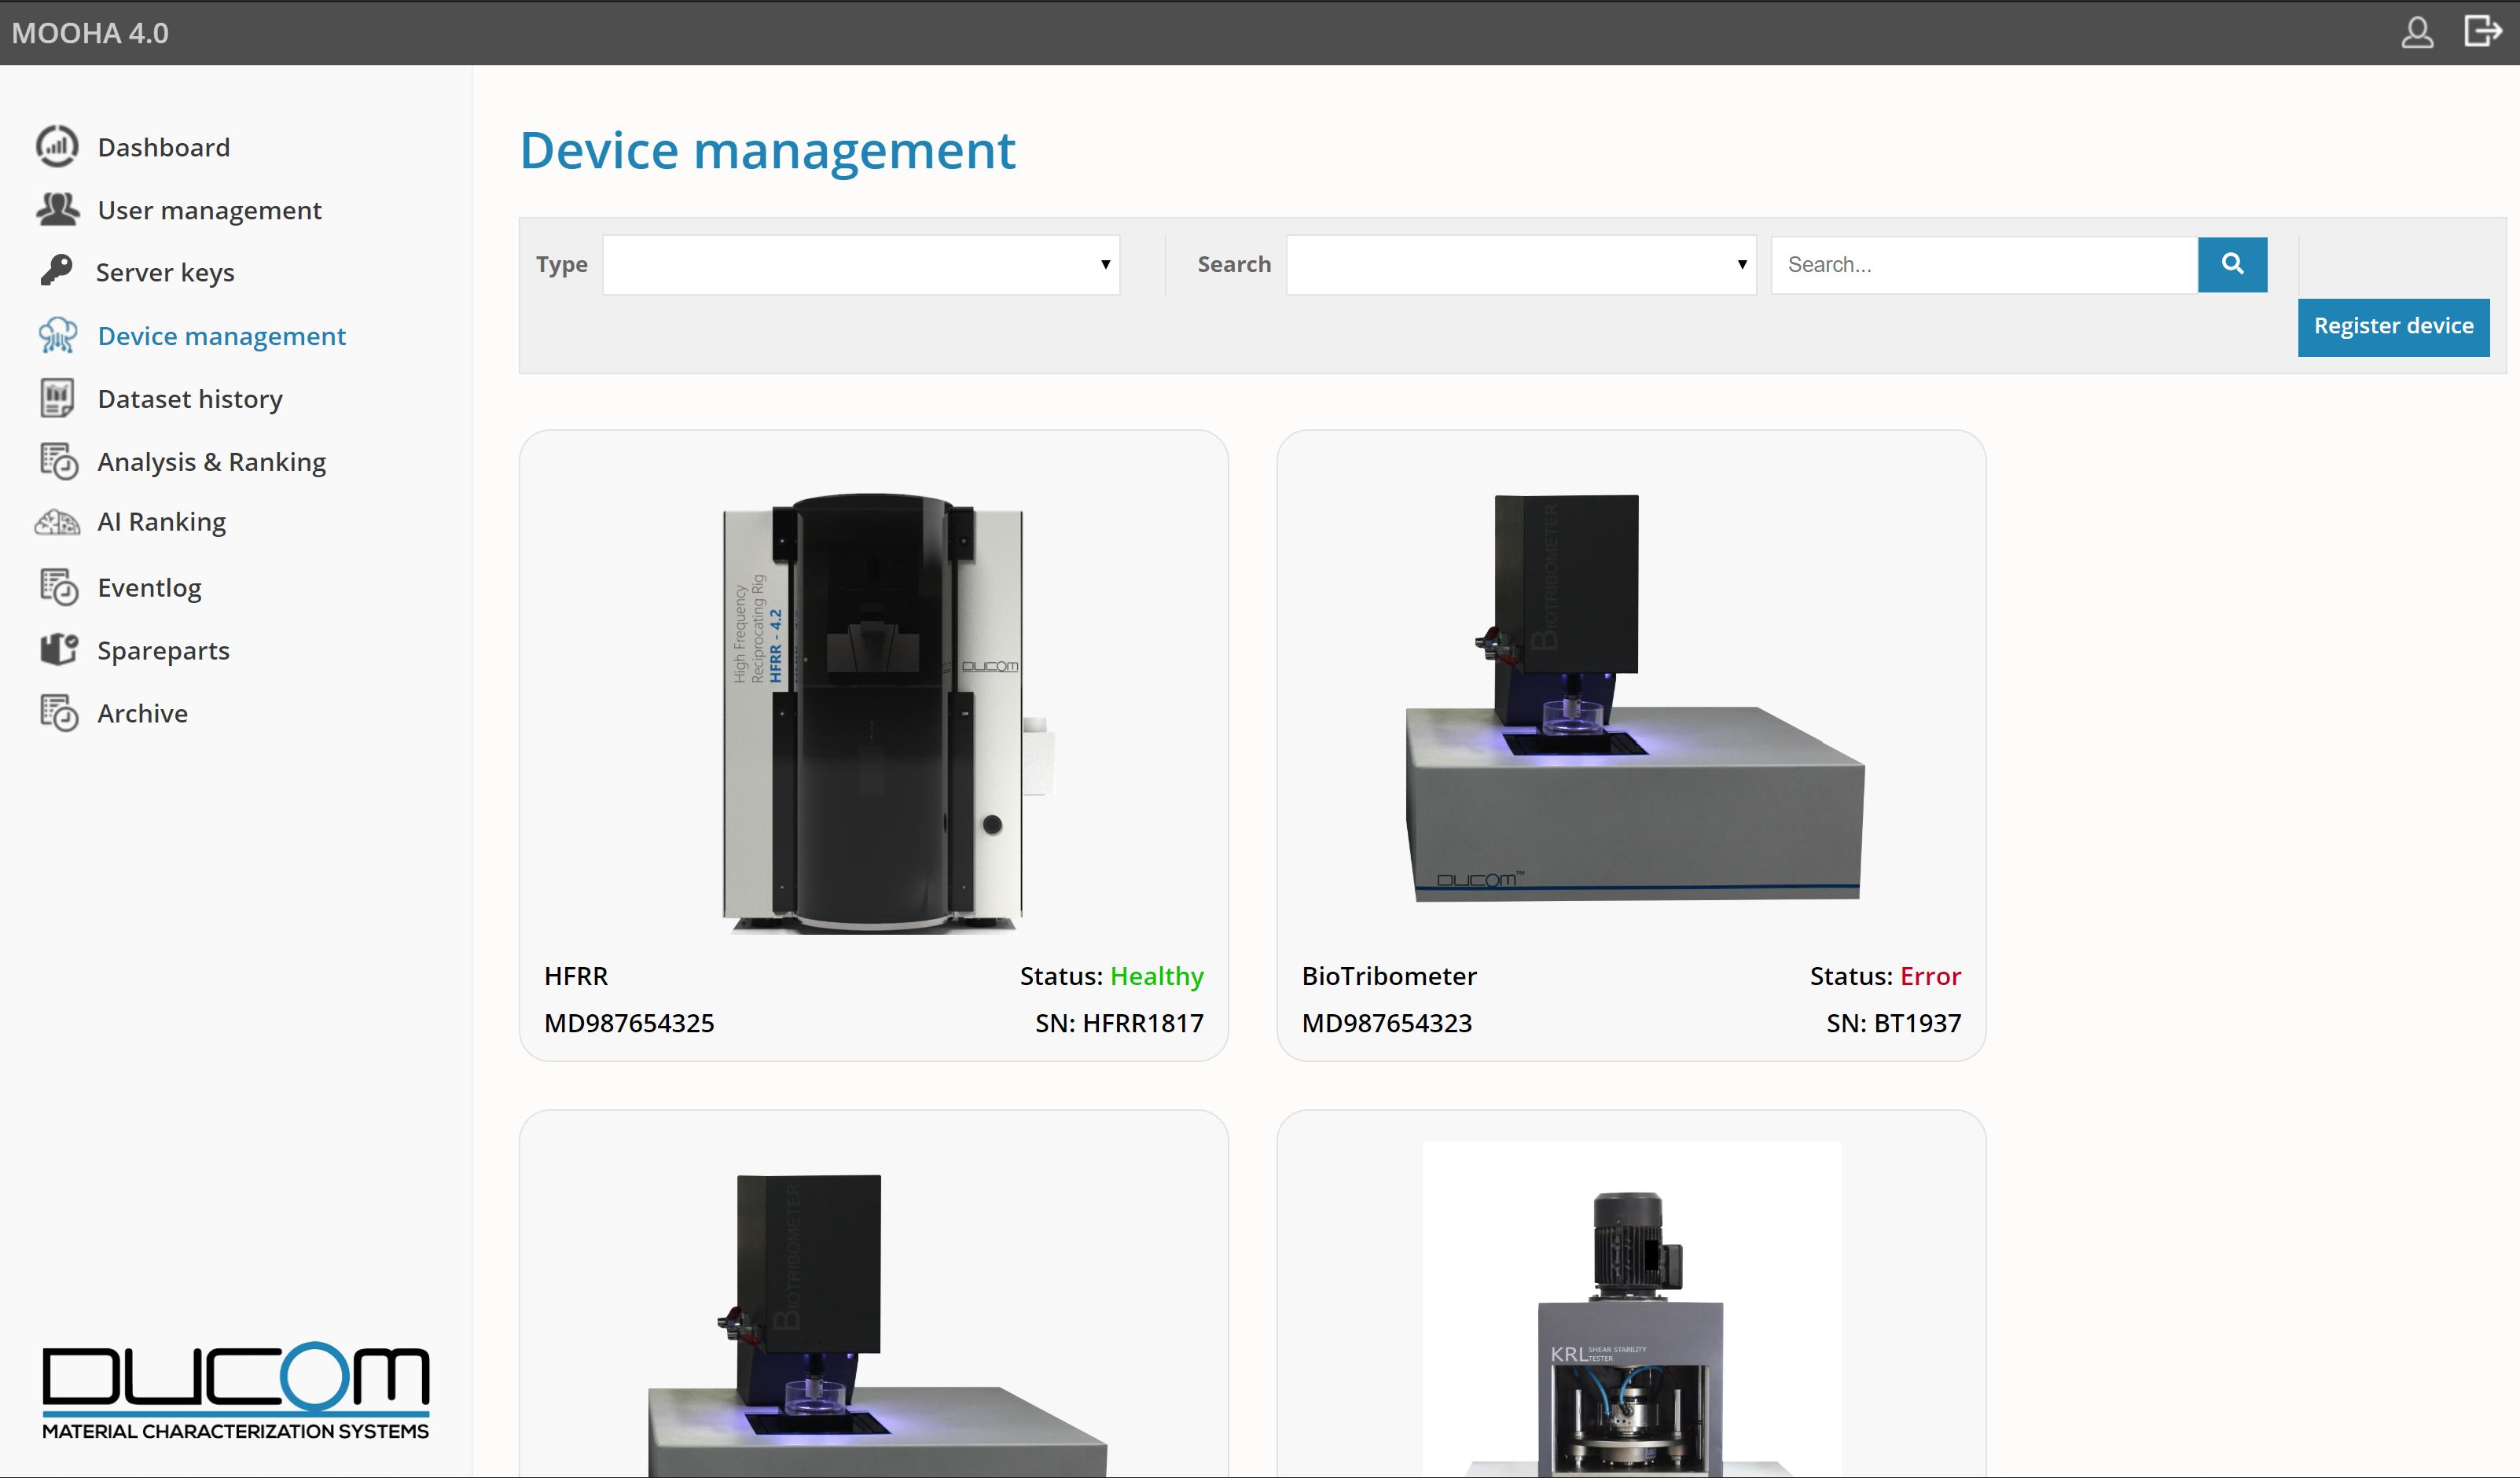 MOOHA - Device Management